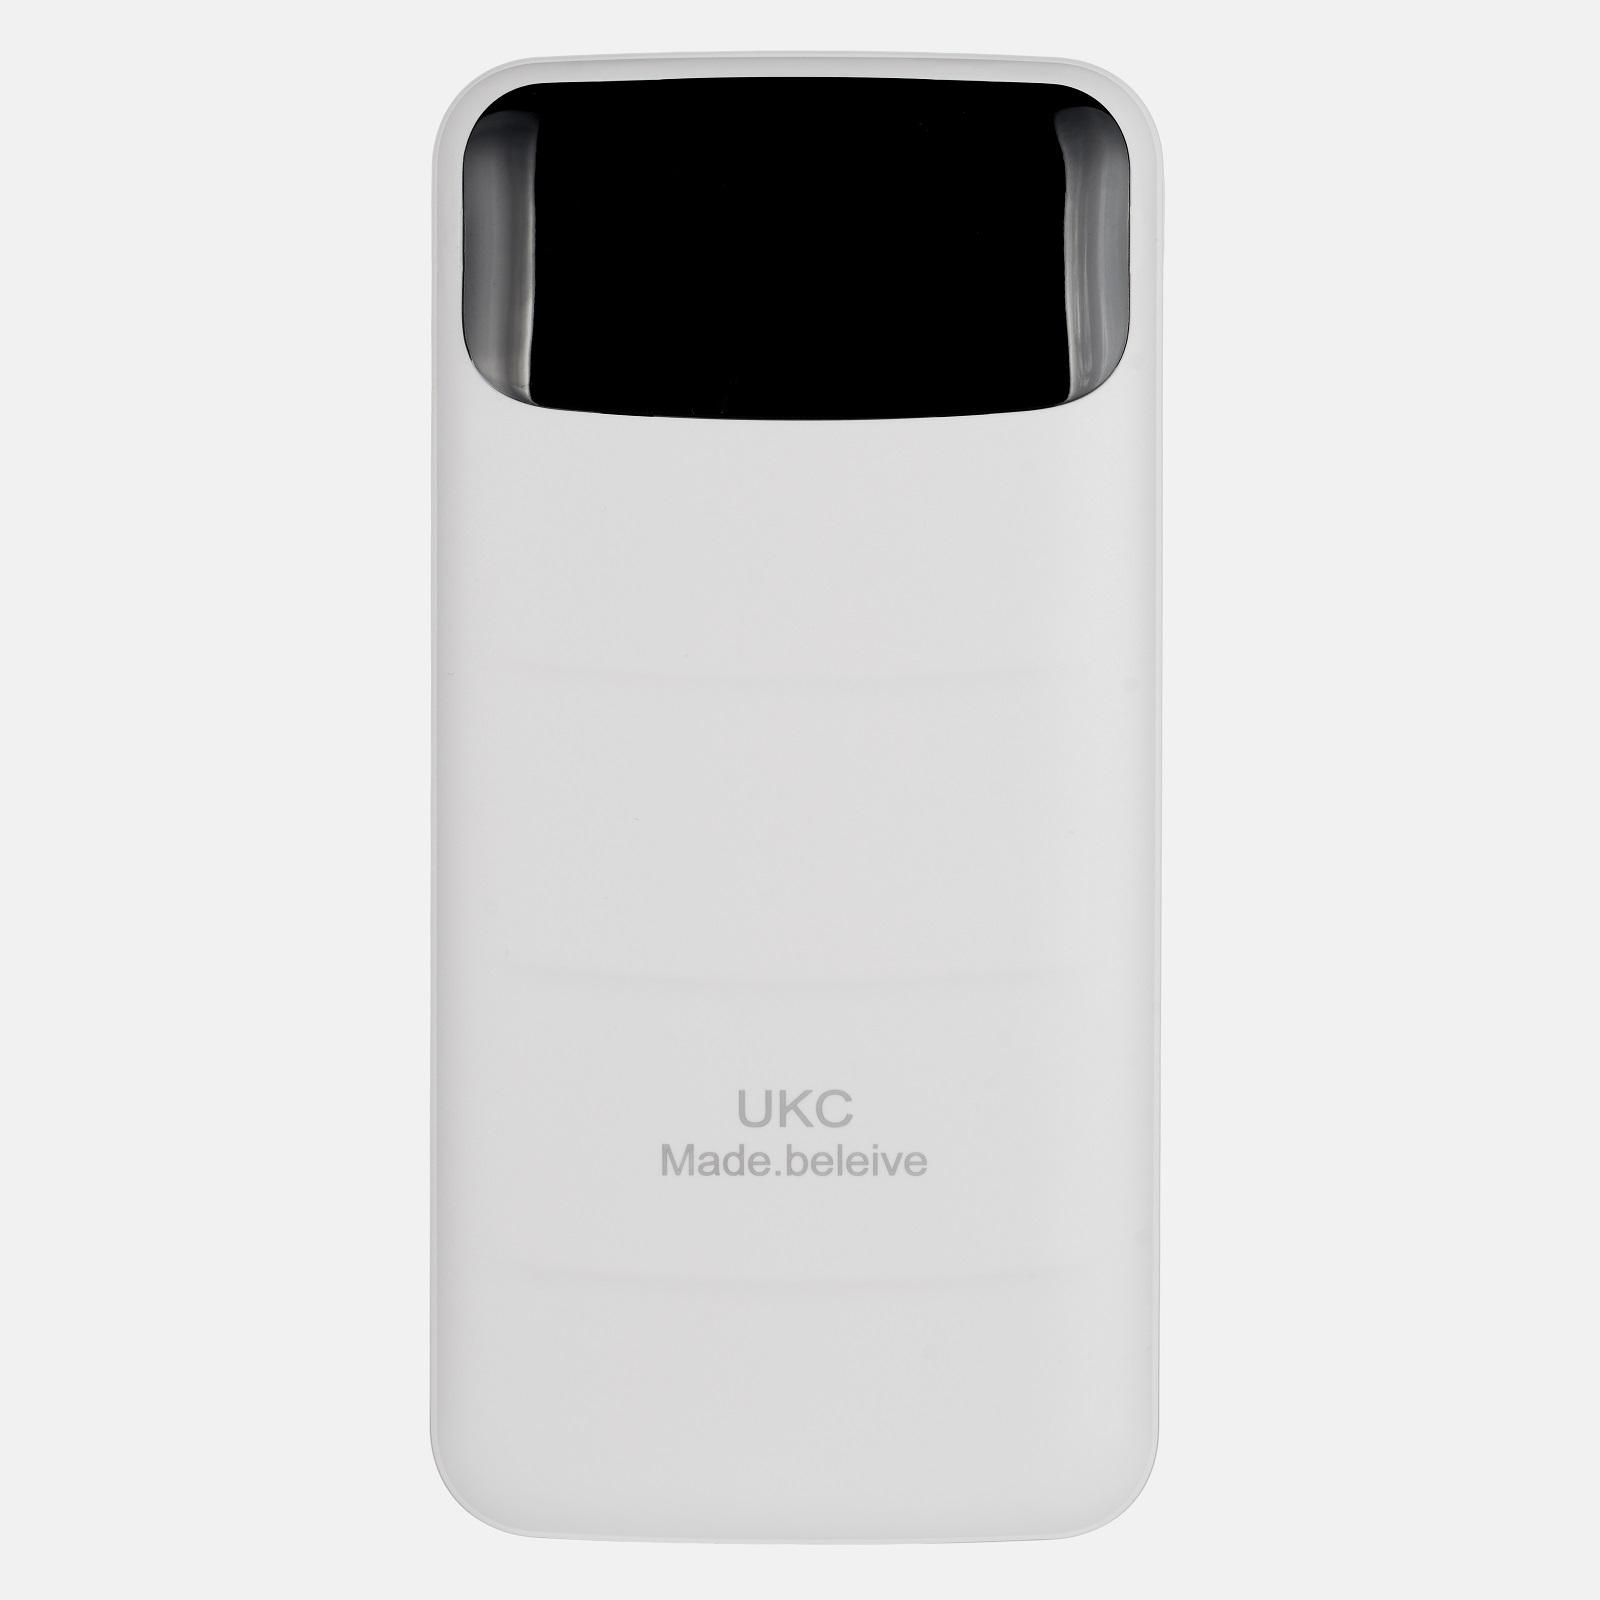 Внешний аккумулятор UKC LCD 80000 мАч White